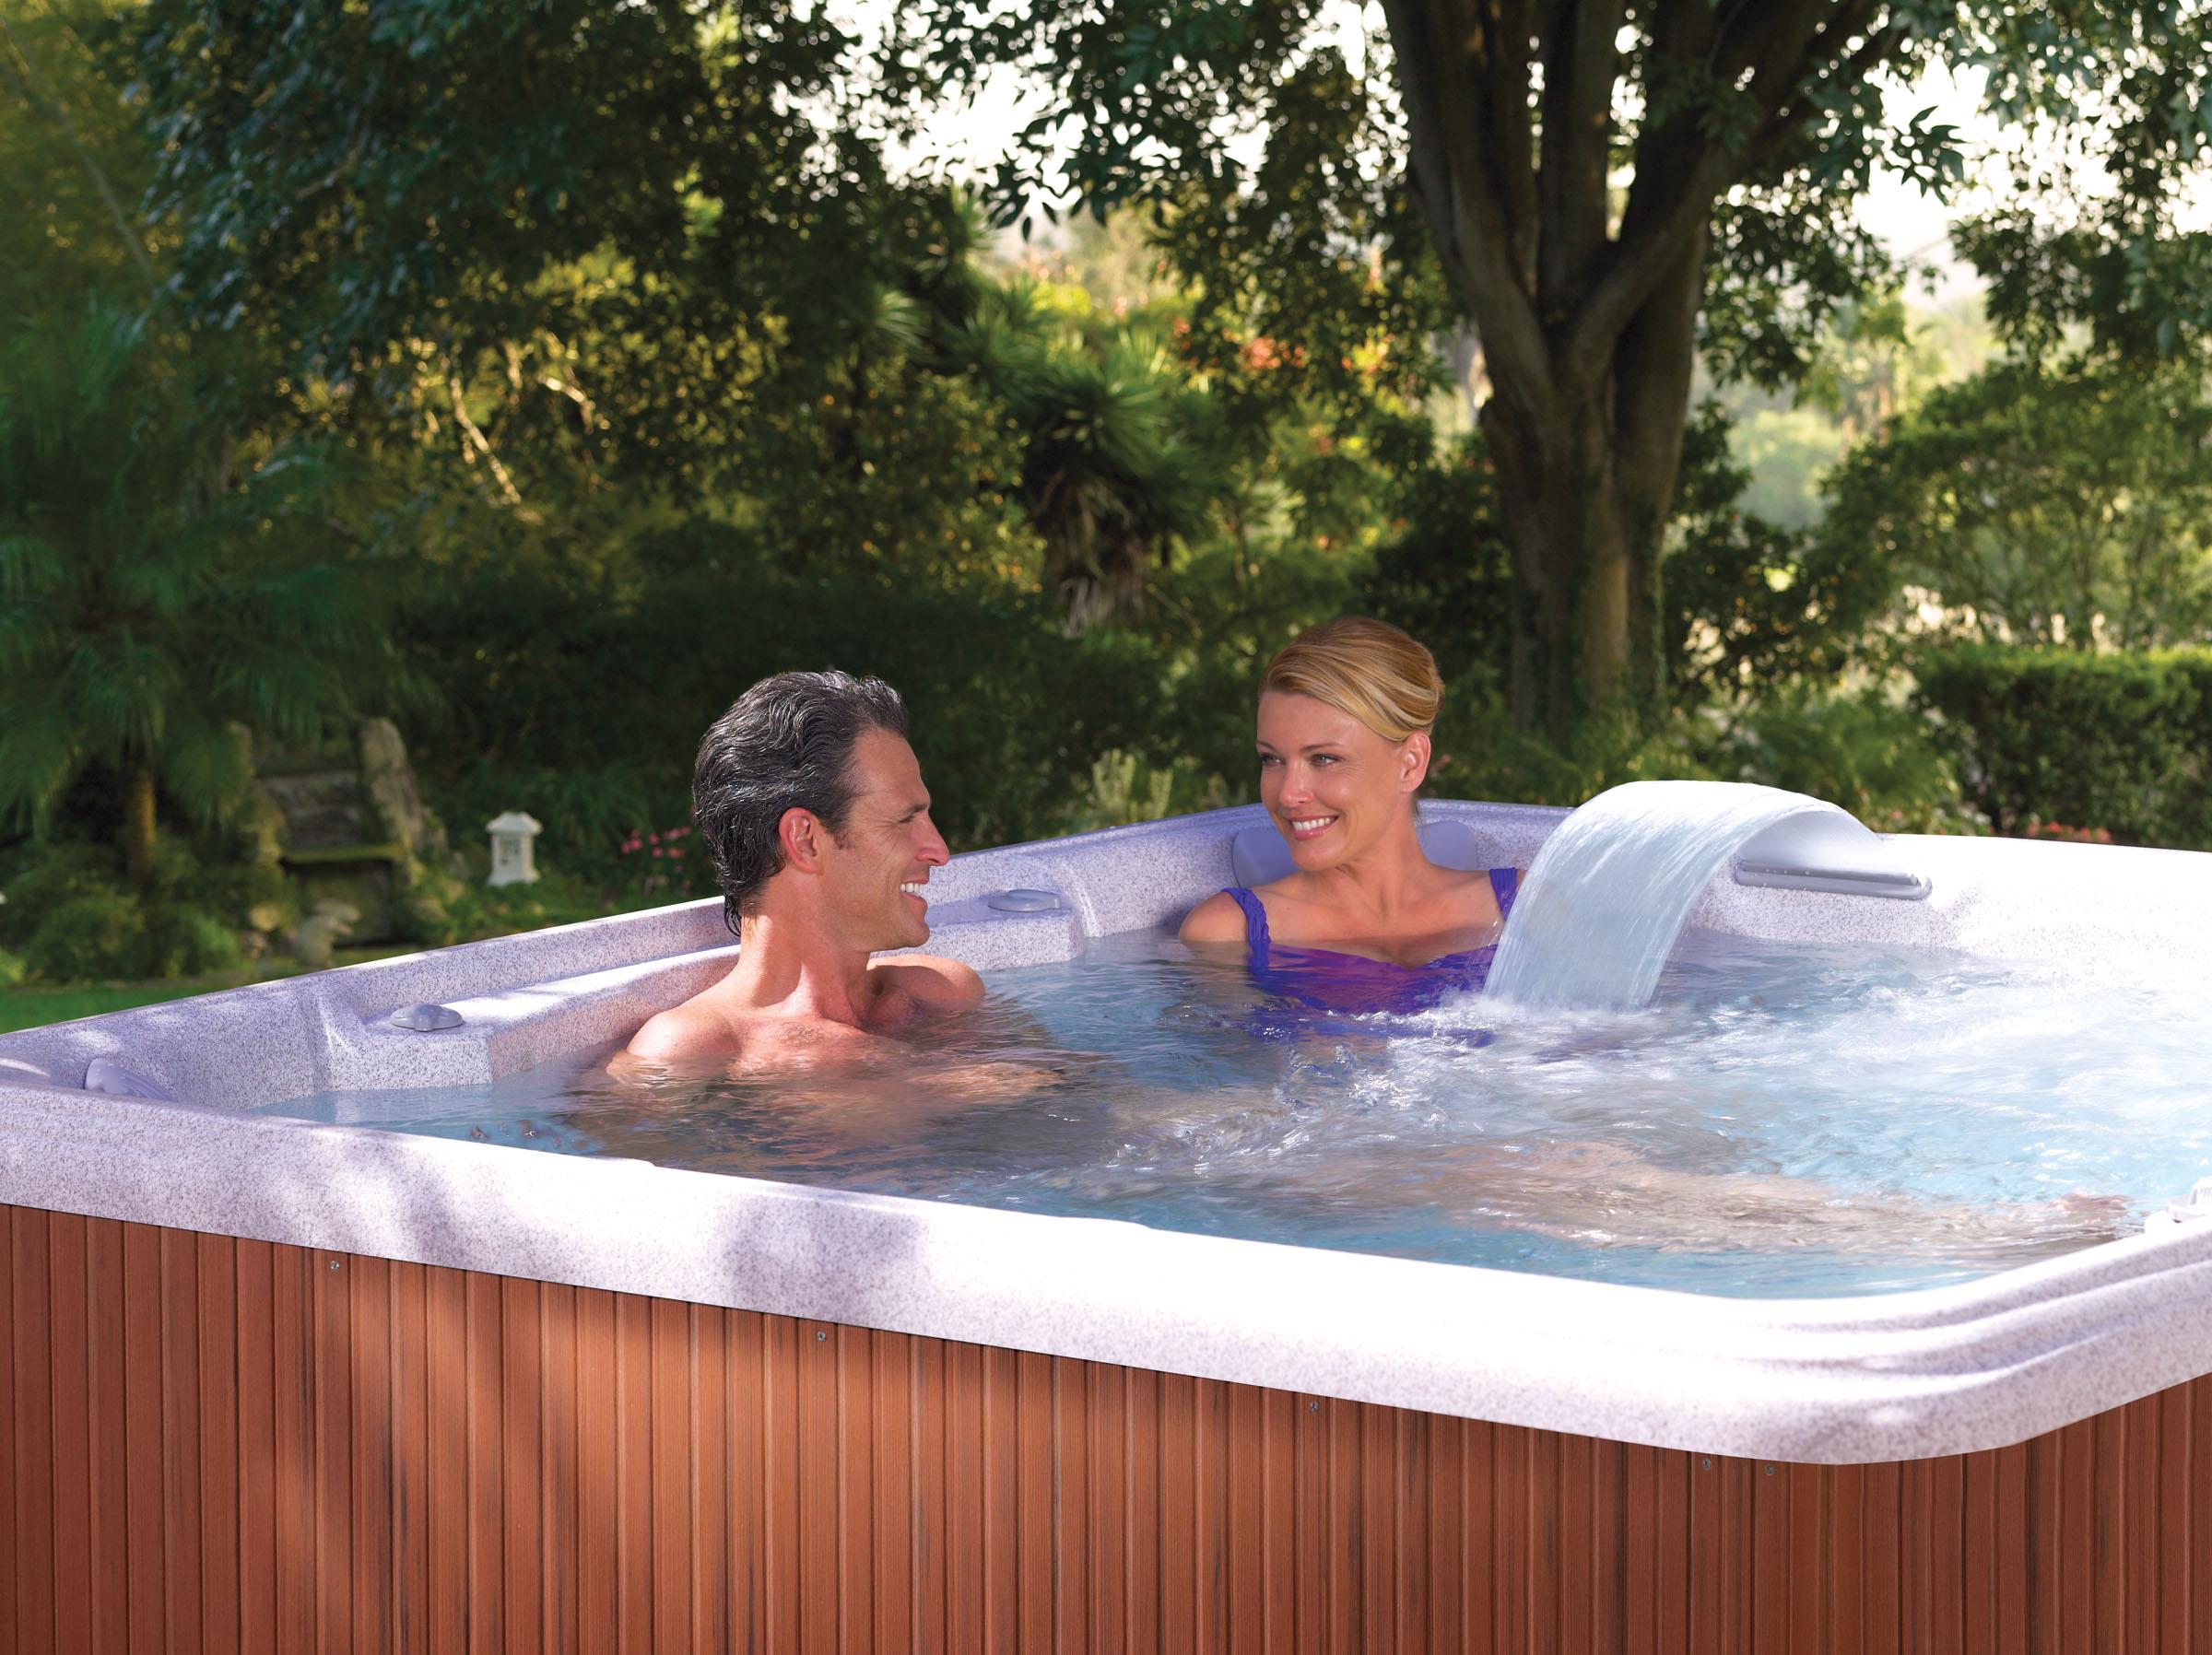 hot-spring-hot-spot-2012-rhythm-lifestyle-01